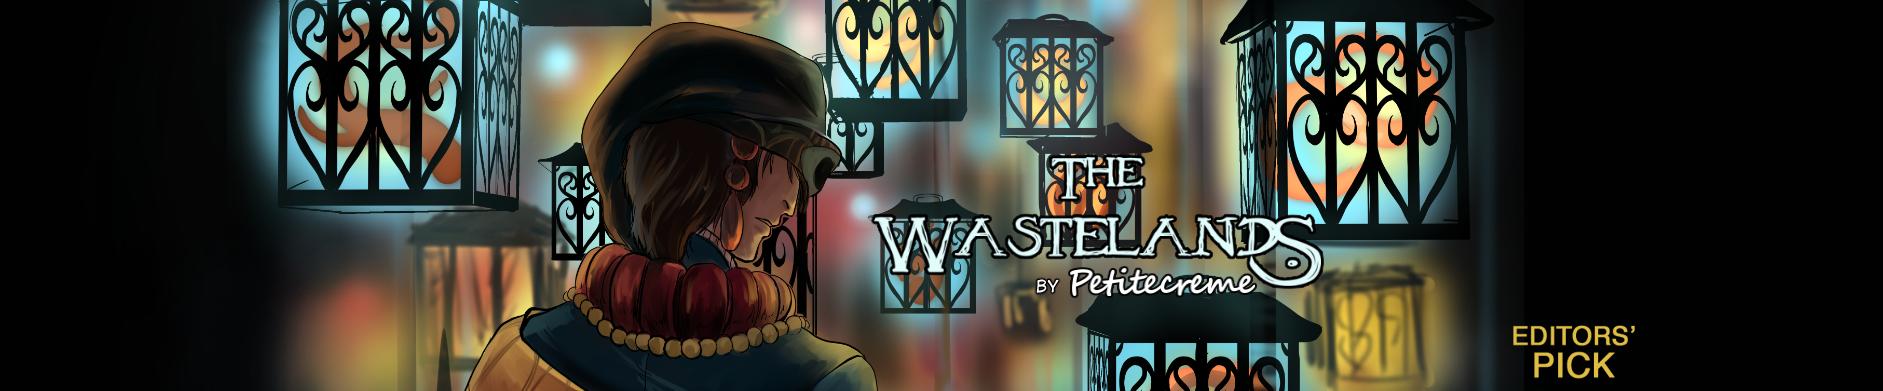 Petitecreme's - The Wastelands: RAHU (CH0)